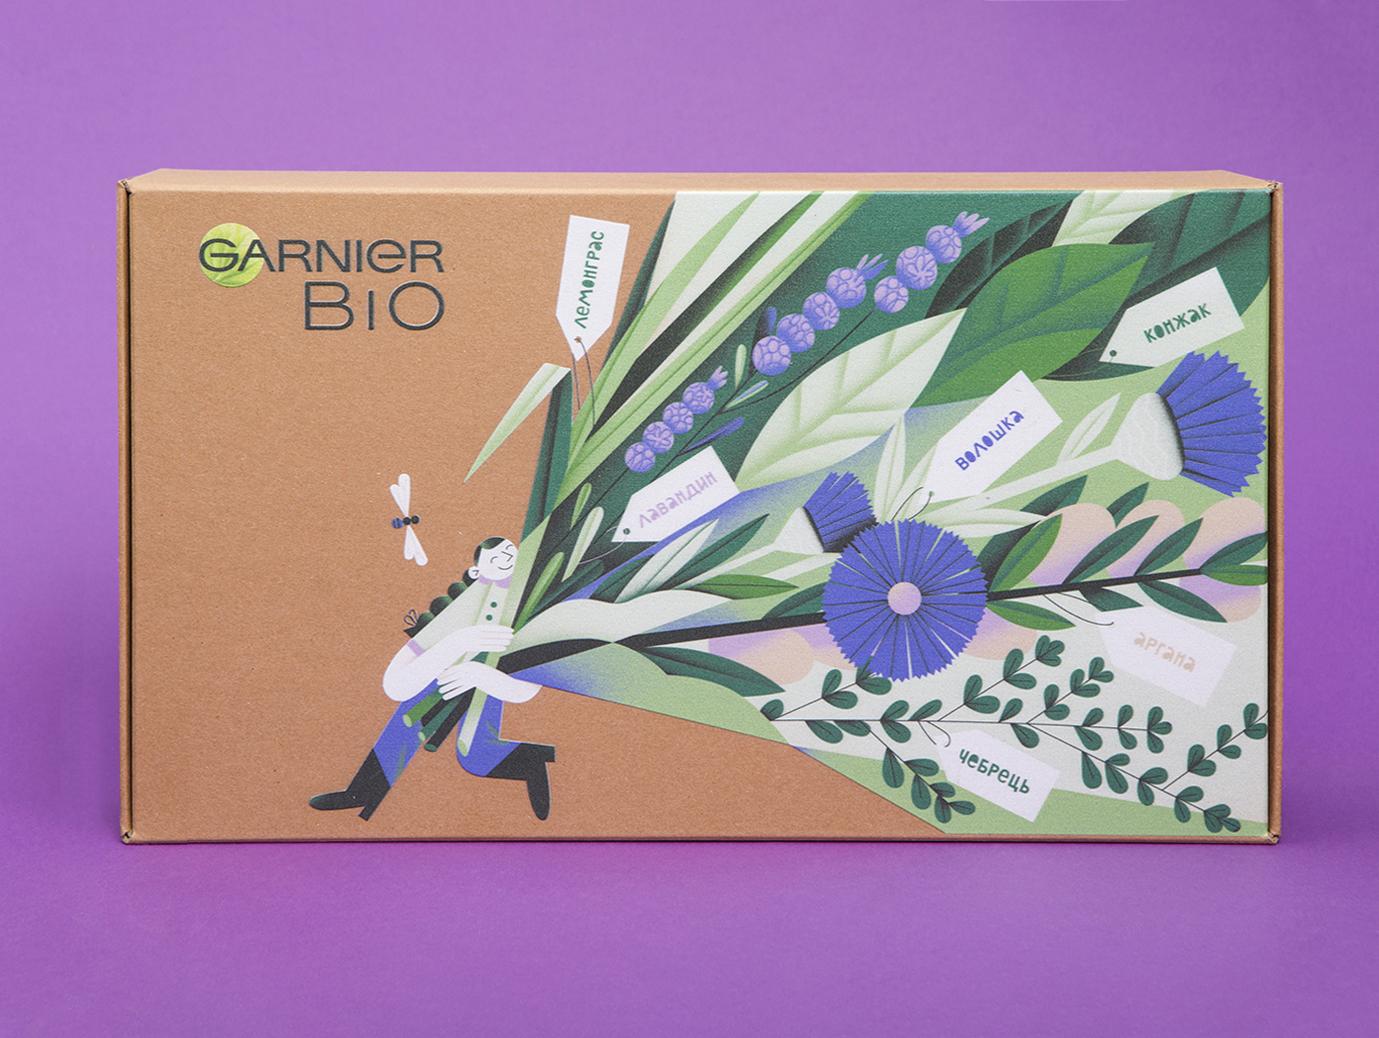 Garnier Bio